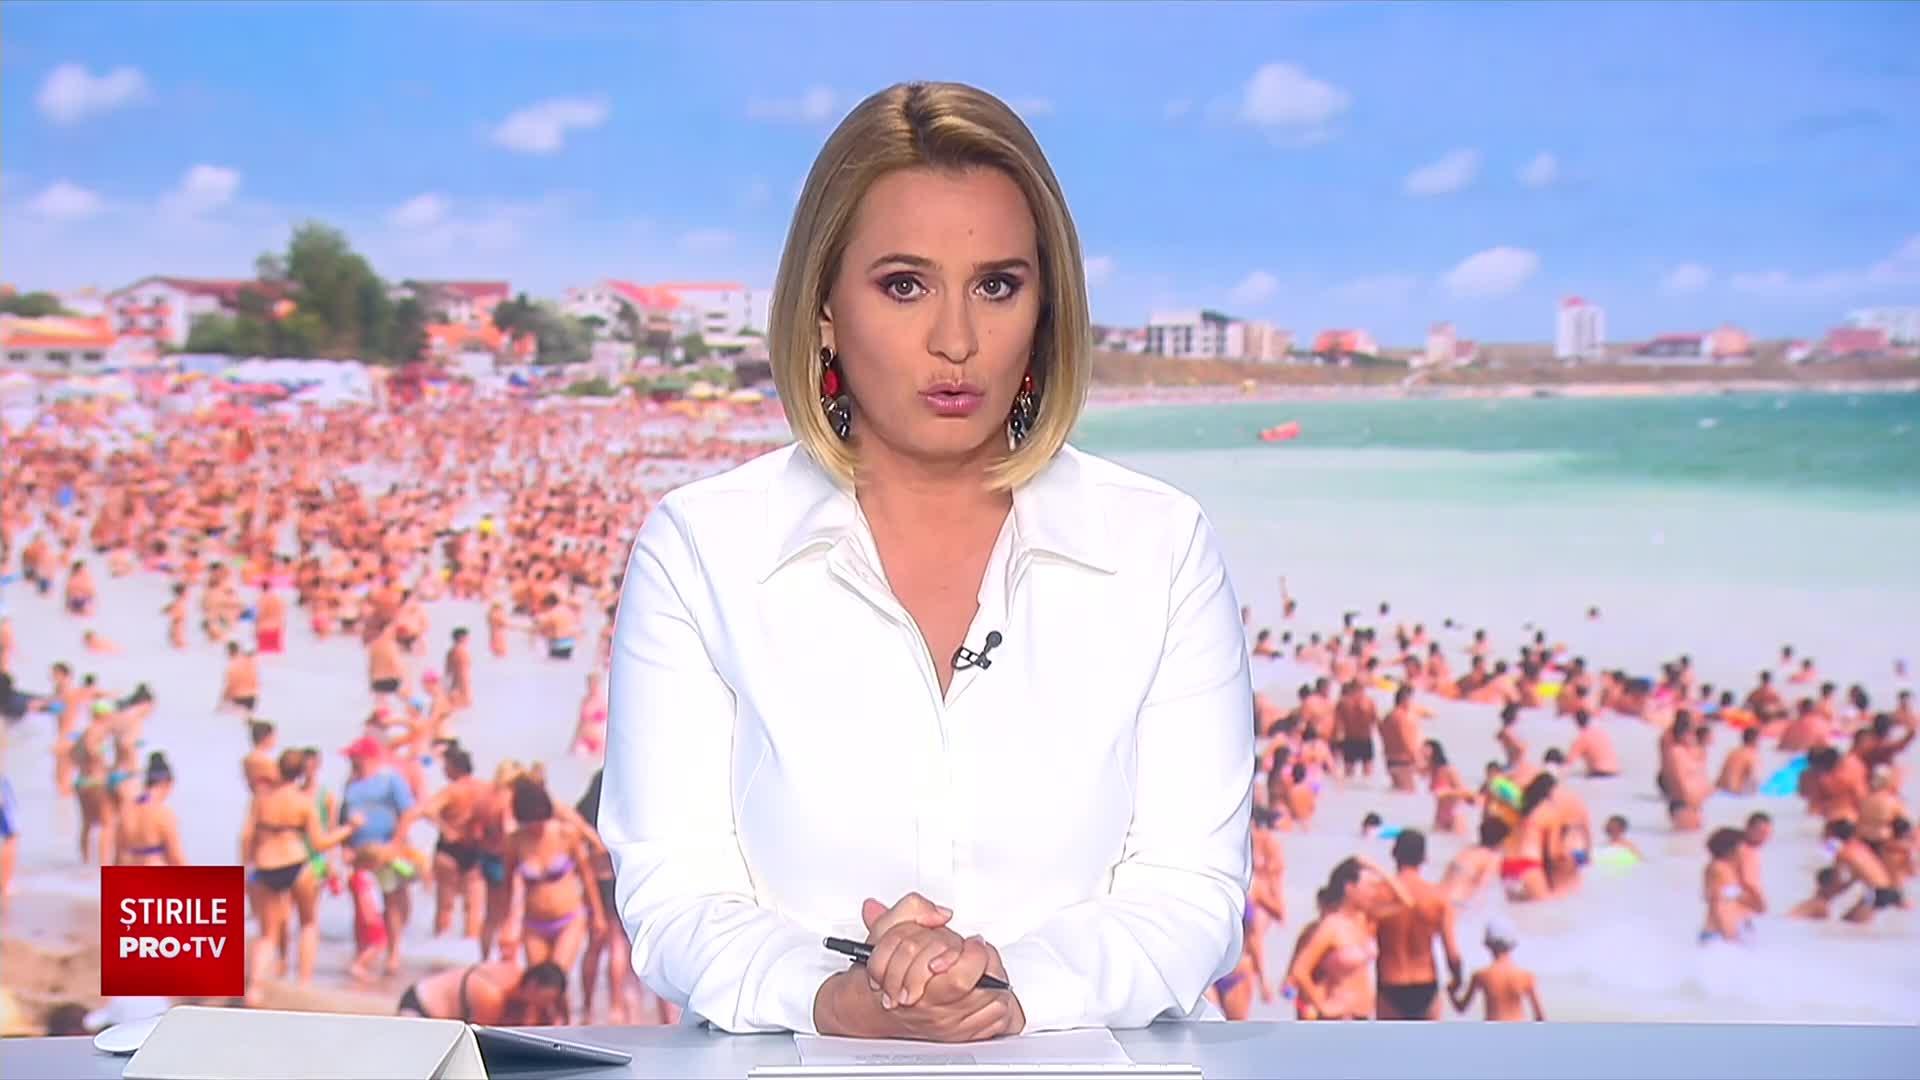 Stirile PRO TV # 19.00 – 29 Iun 2020